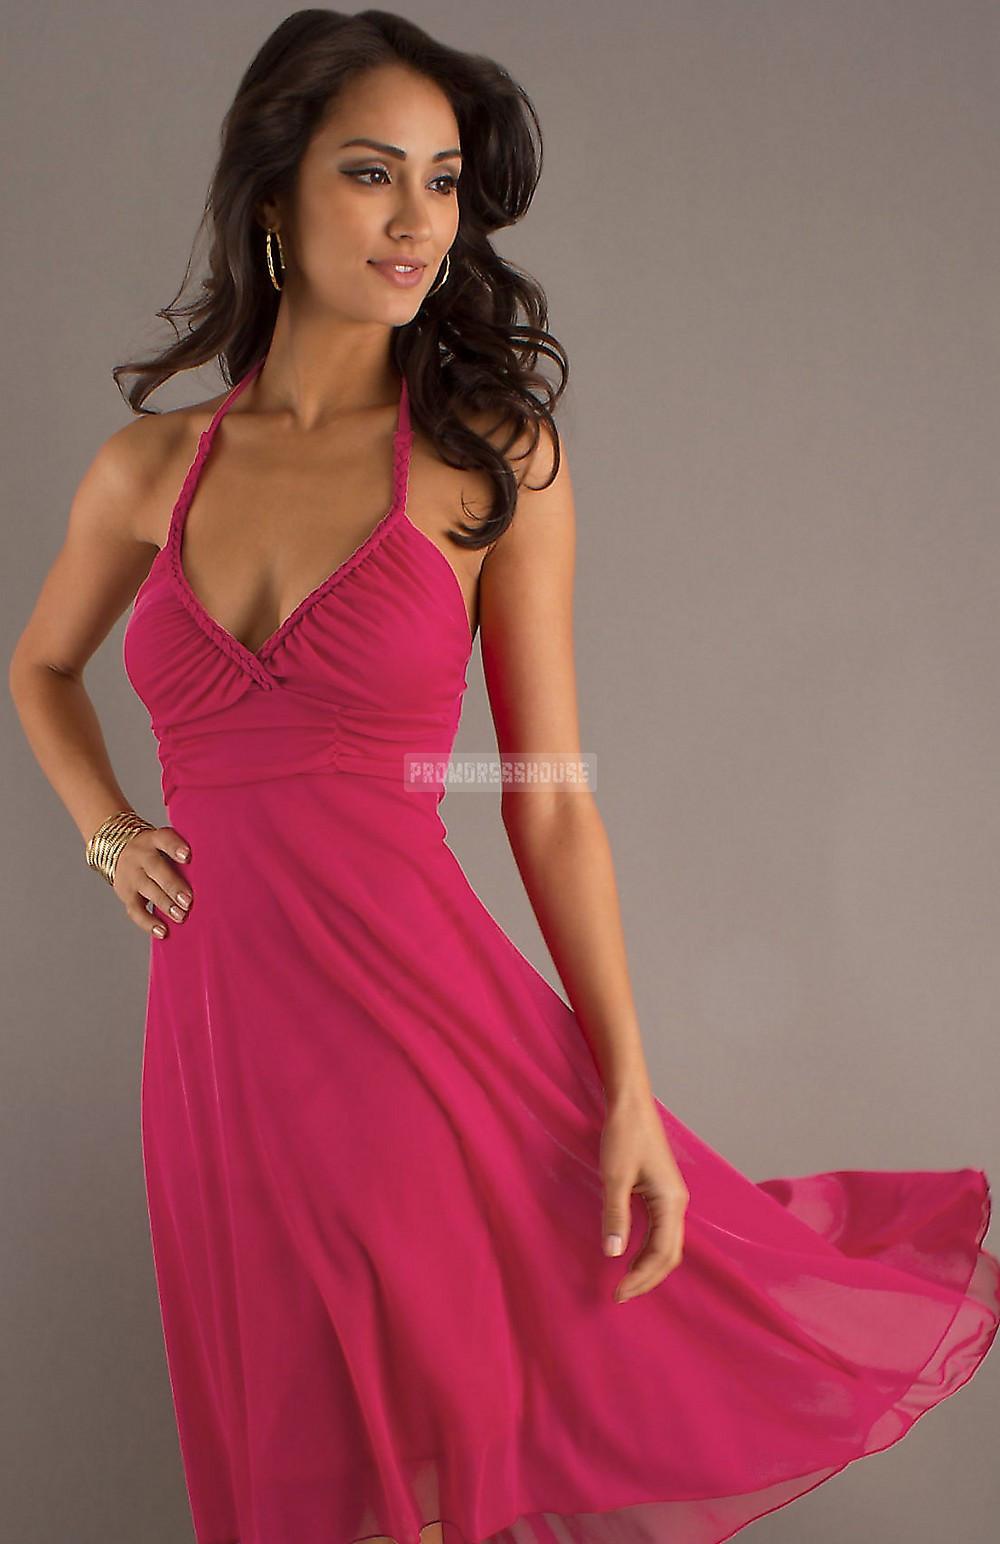 Chiffon Fuchsia Knee Length Backless Halter A-line Prom Dress - Promdresshouse.com